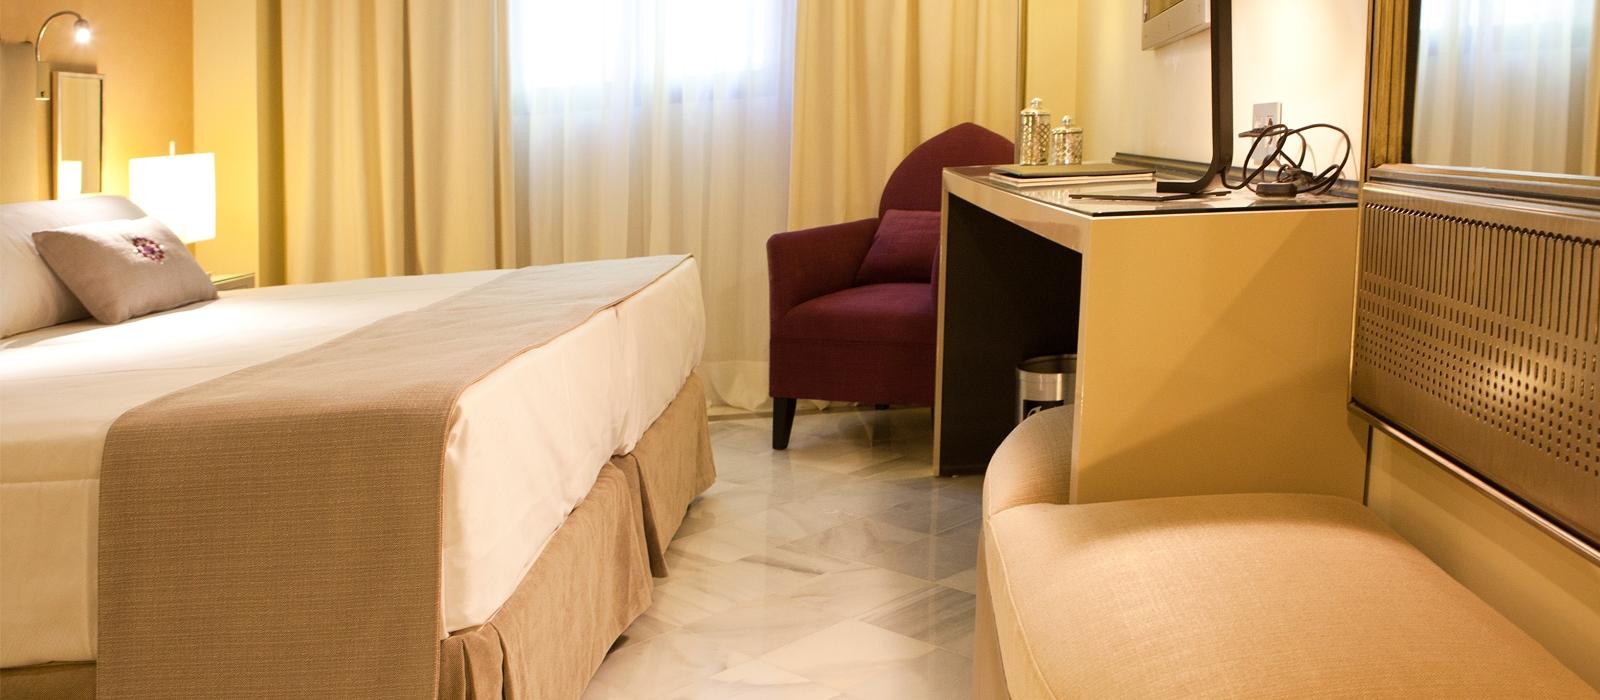 Accessibles aux handicapes - Chambres Hôtel Vincci Grenade Albaicín